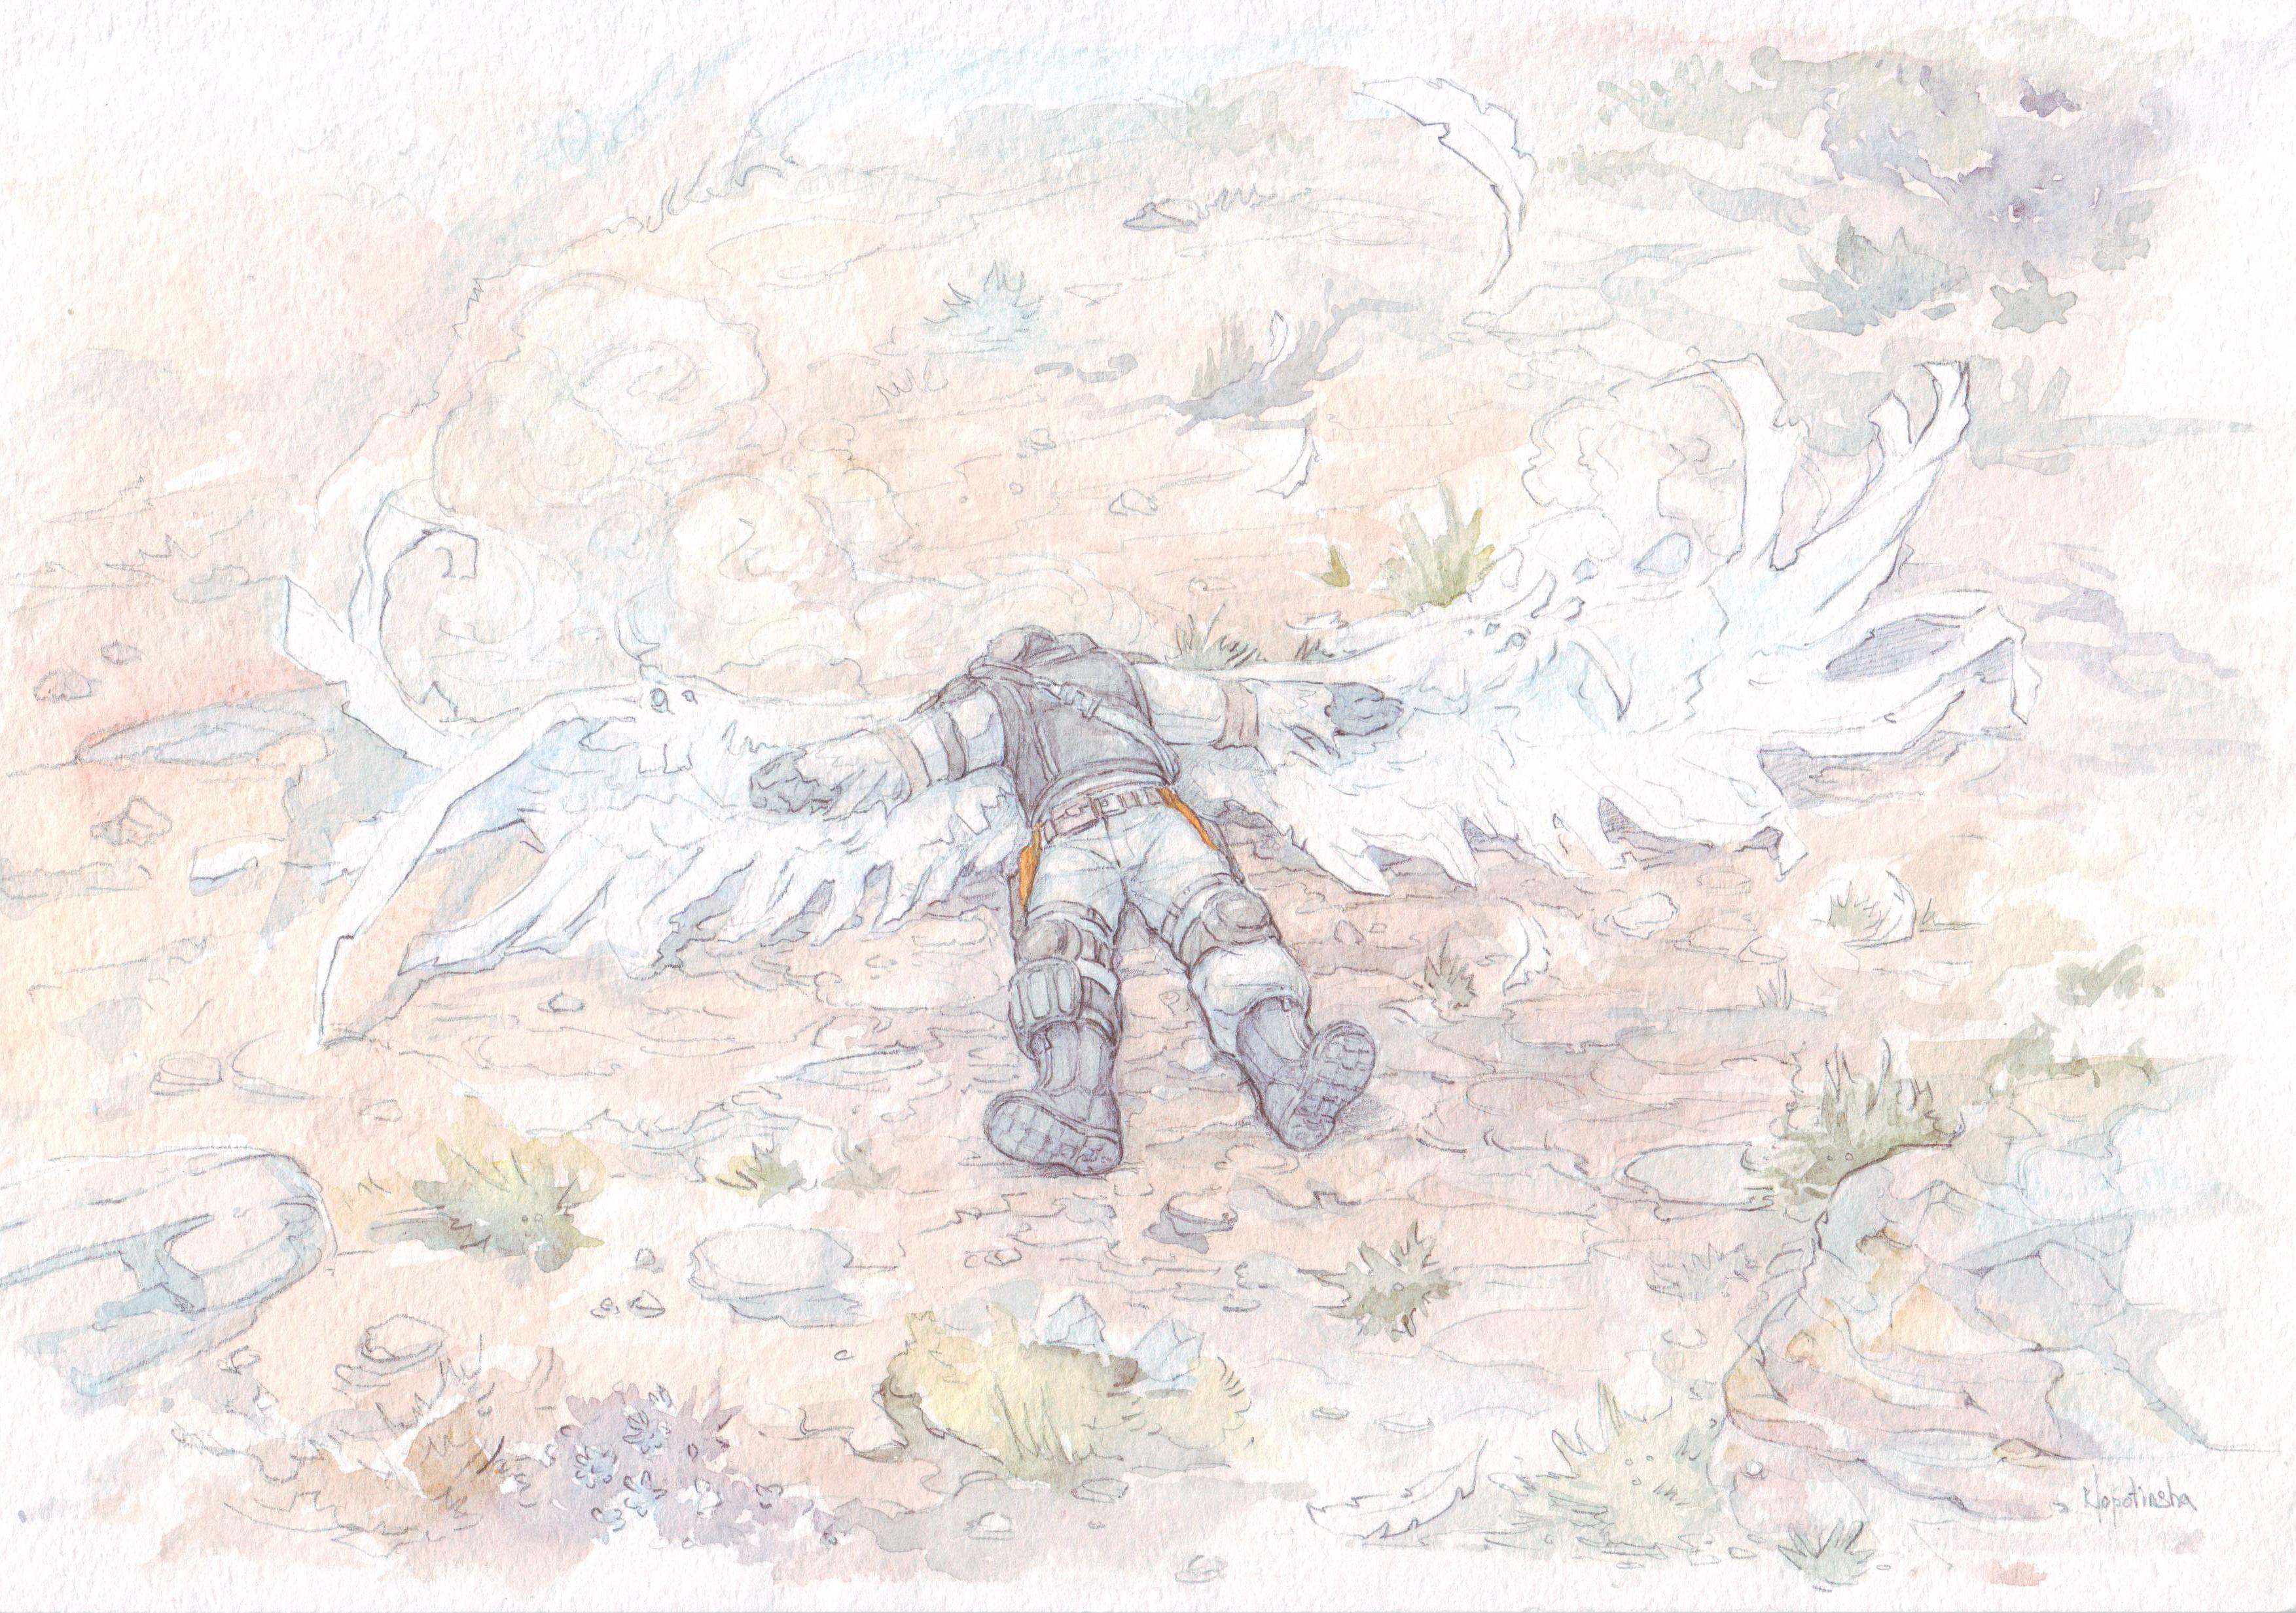 9 - everlasting Icarus